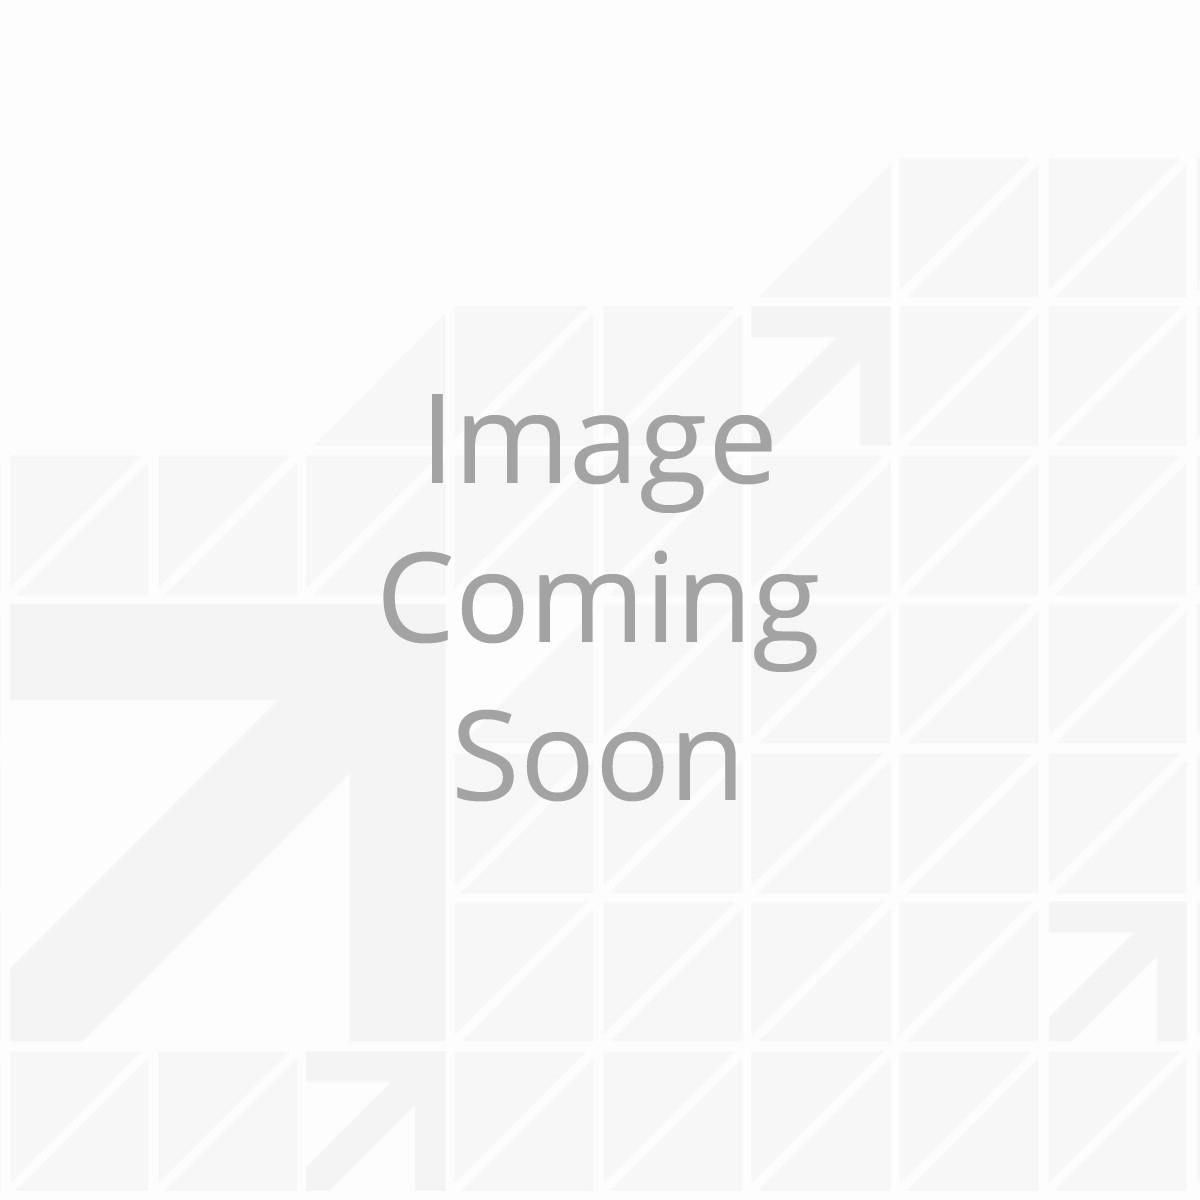 182274_Hex-Nut_001